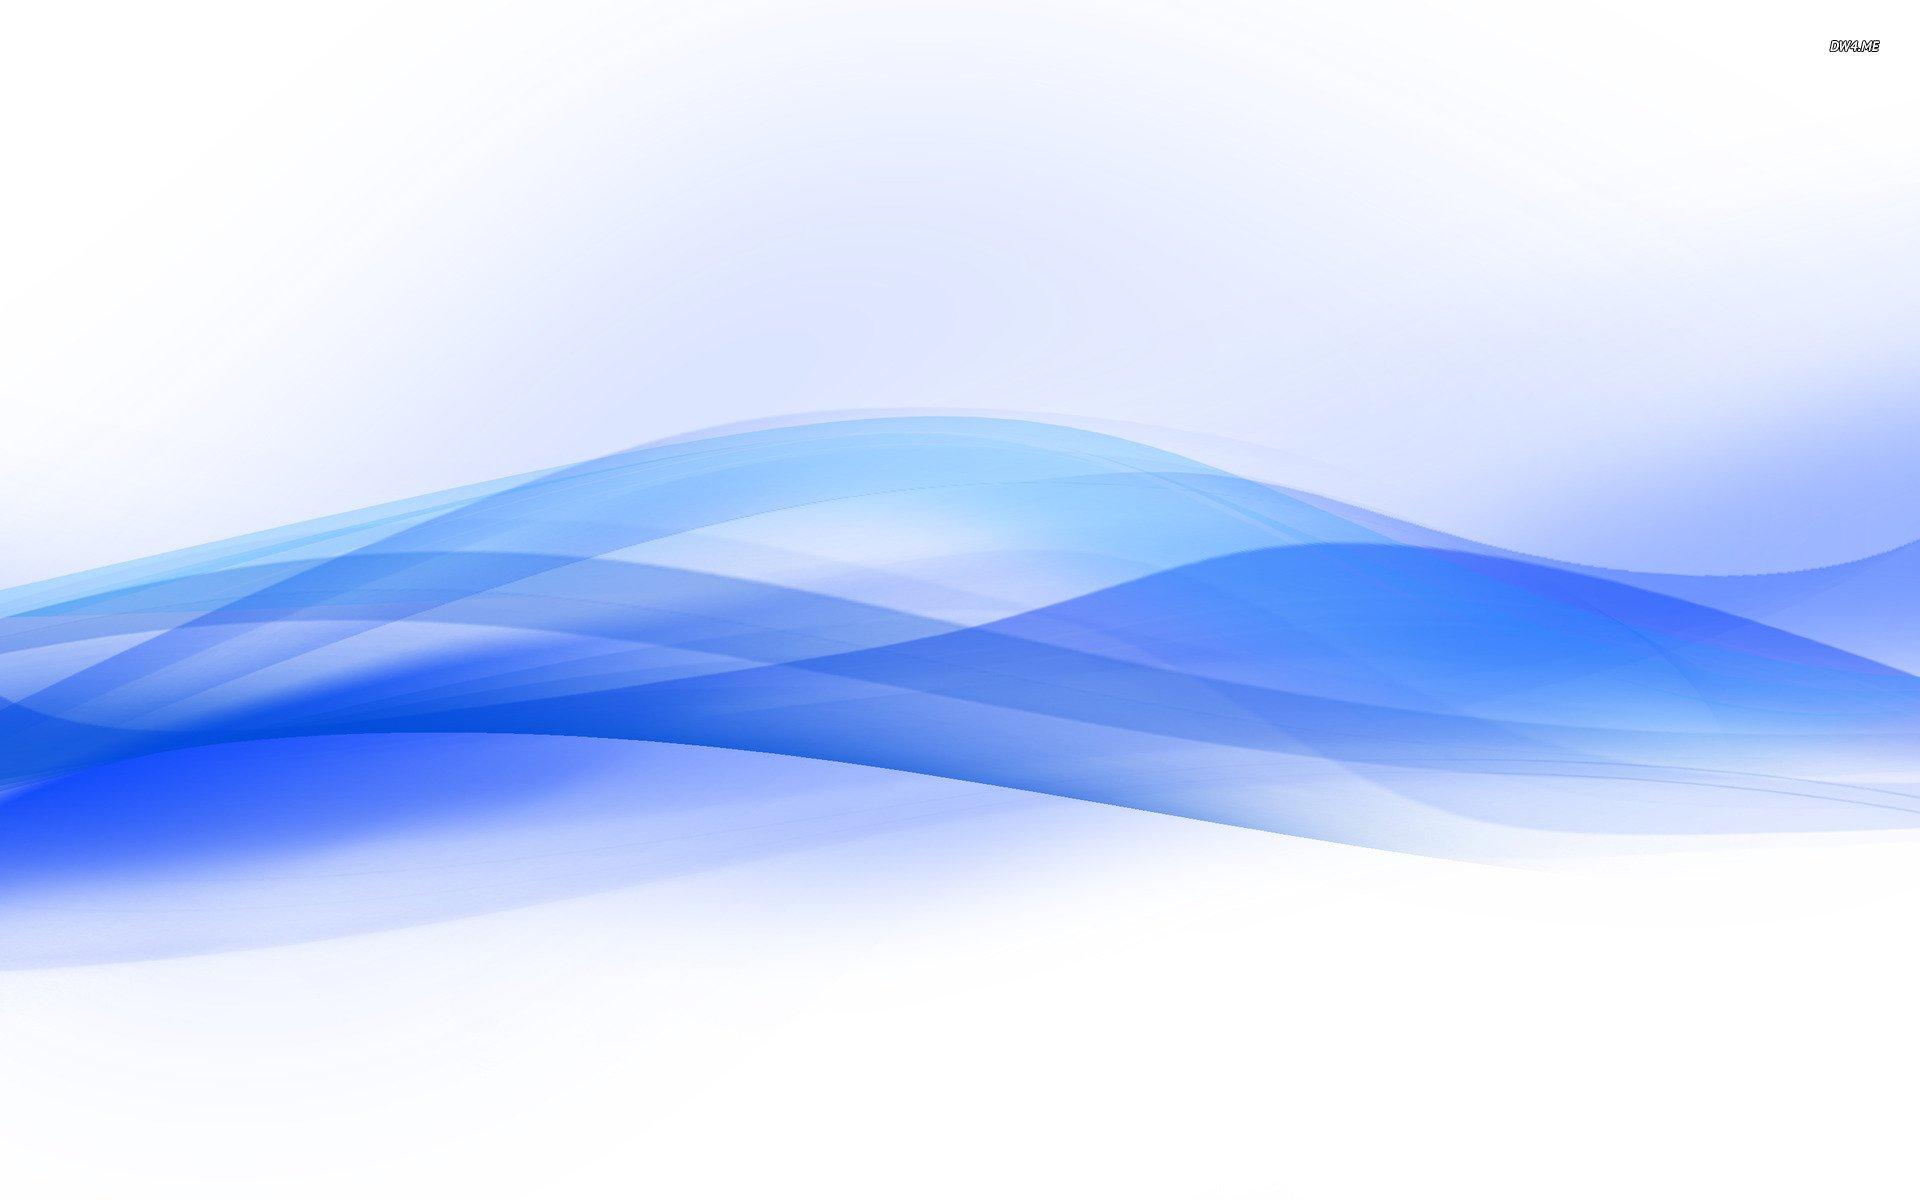 Blue Waves 737657 - WallDevil